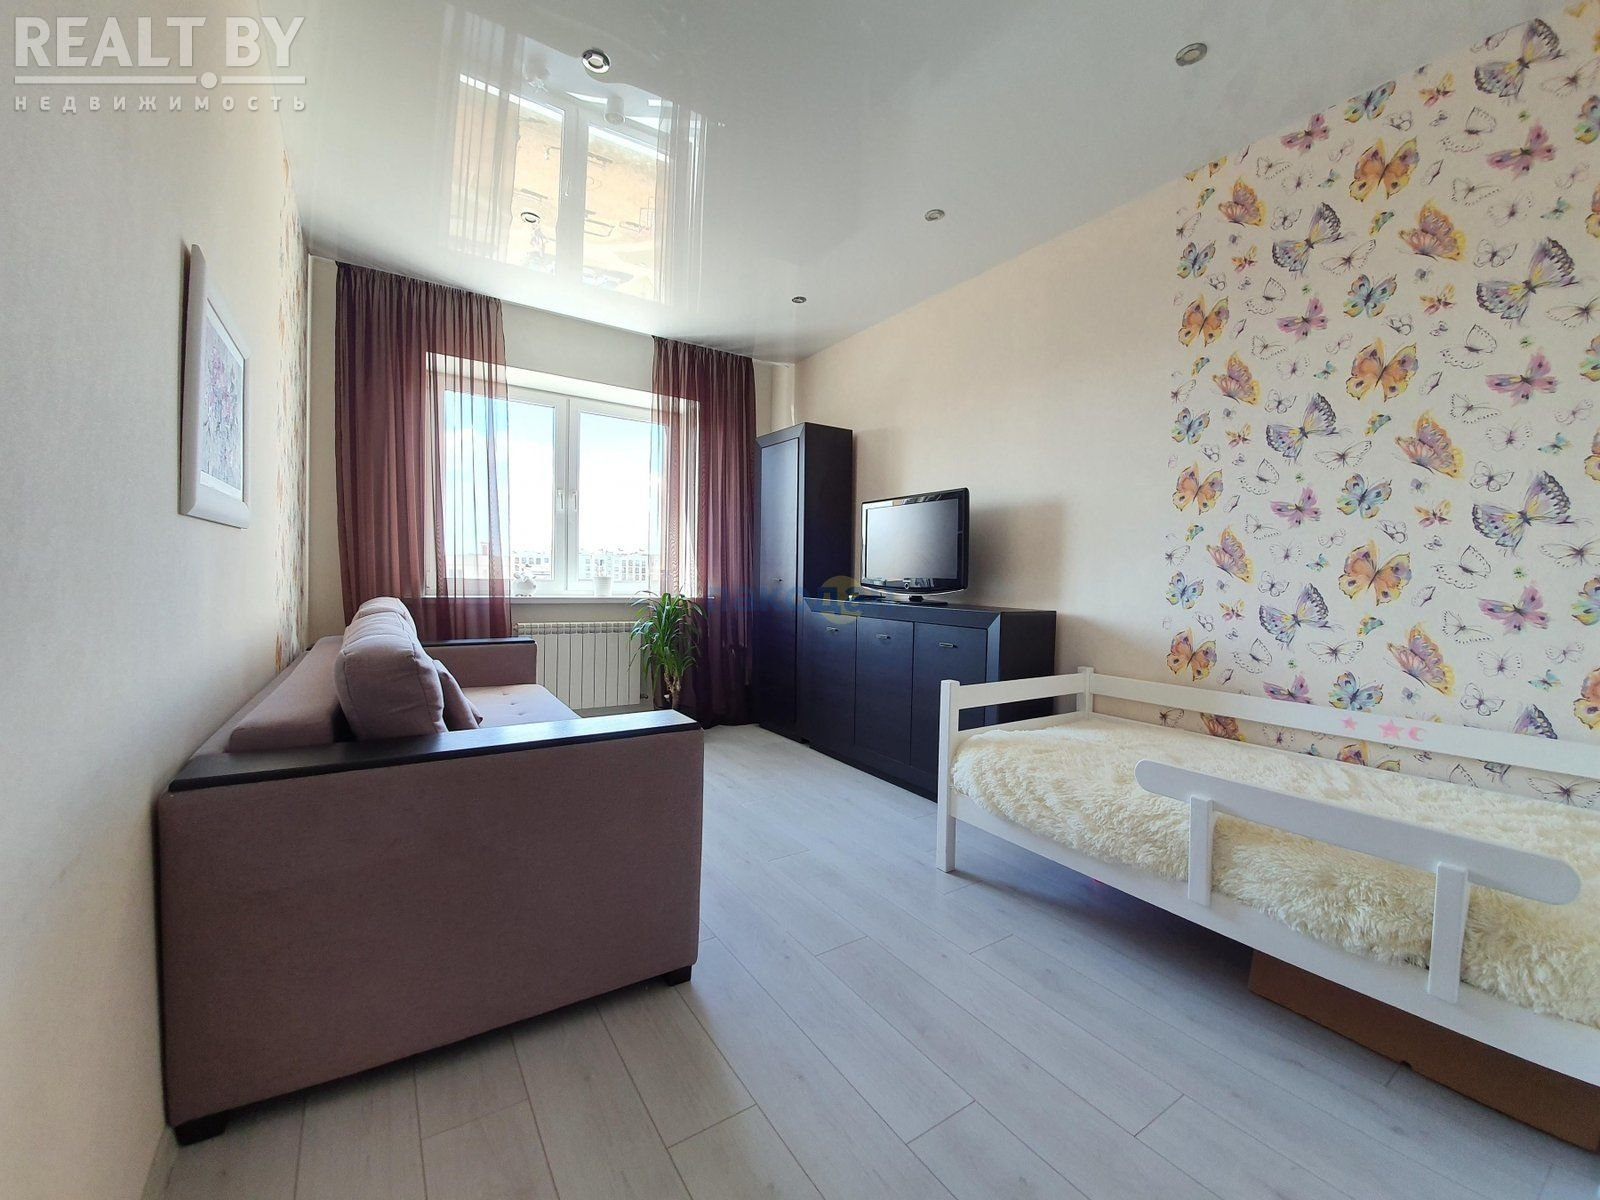 Продается 2-х комнатная квартира, Копище - фото №15